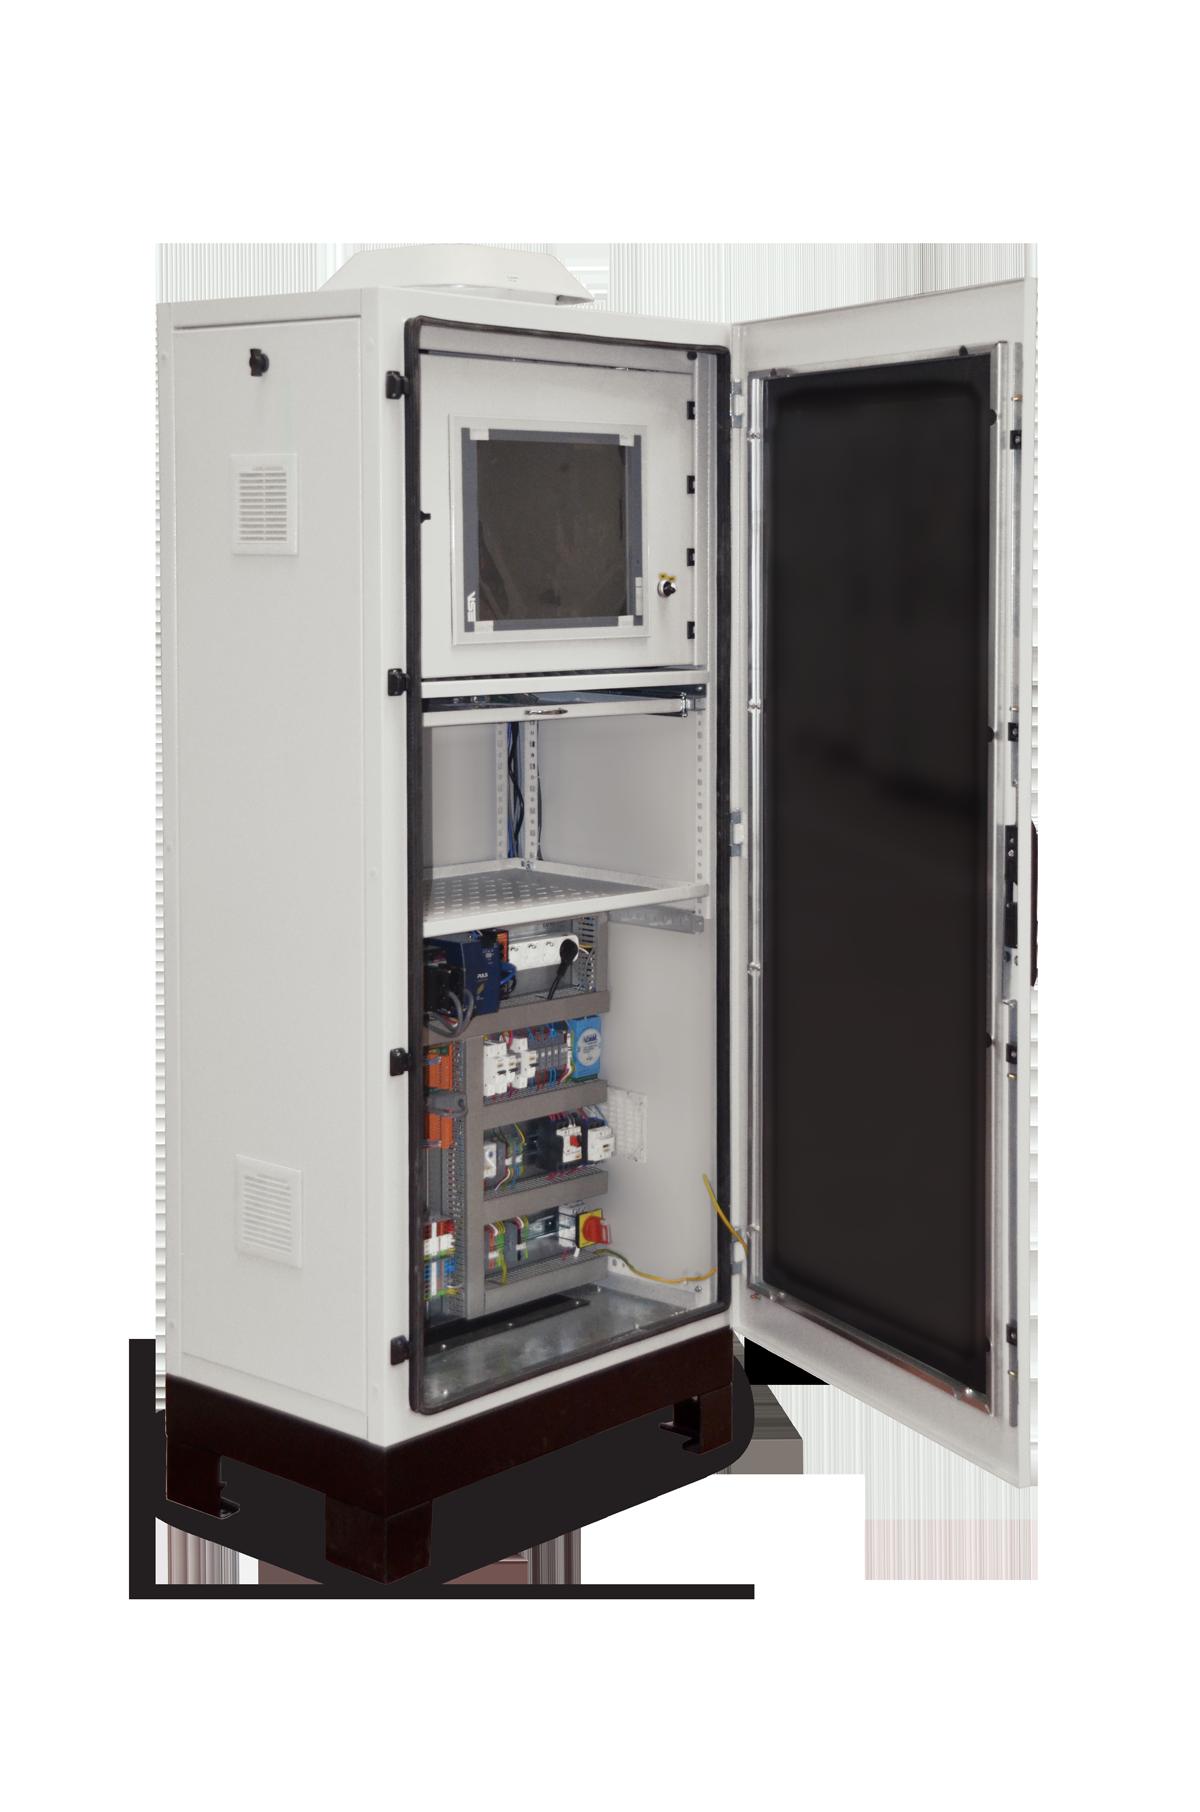 Müstakil PLC Kontrollü Randıman Kantarları – Tubex Tip 40/80/120 Lt.1